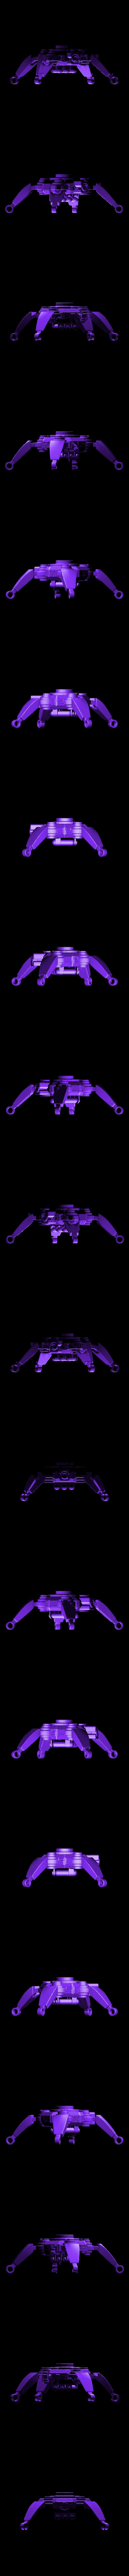 Body.stl Download free STL file Posable Sci-Fi Tank - MK 01 • Design to 3D print, CarlCreates